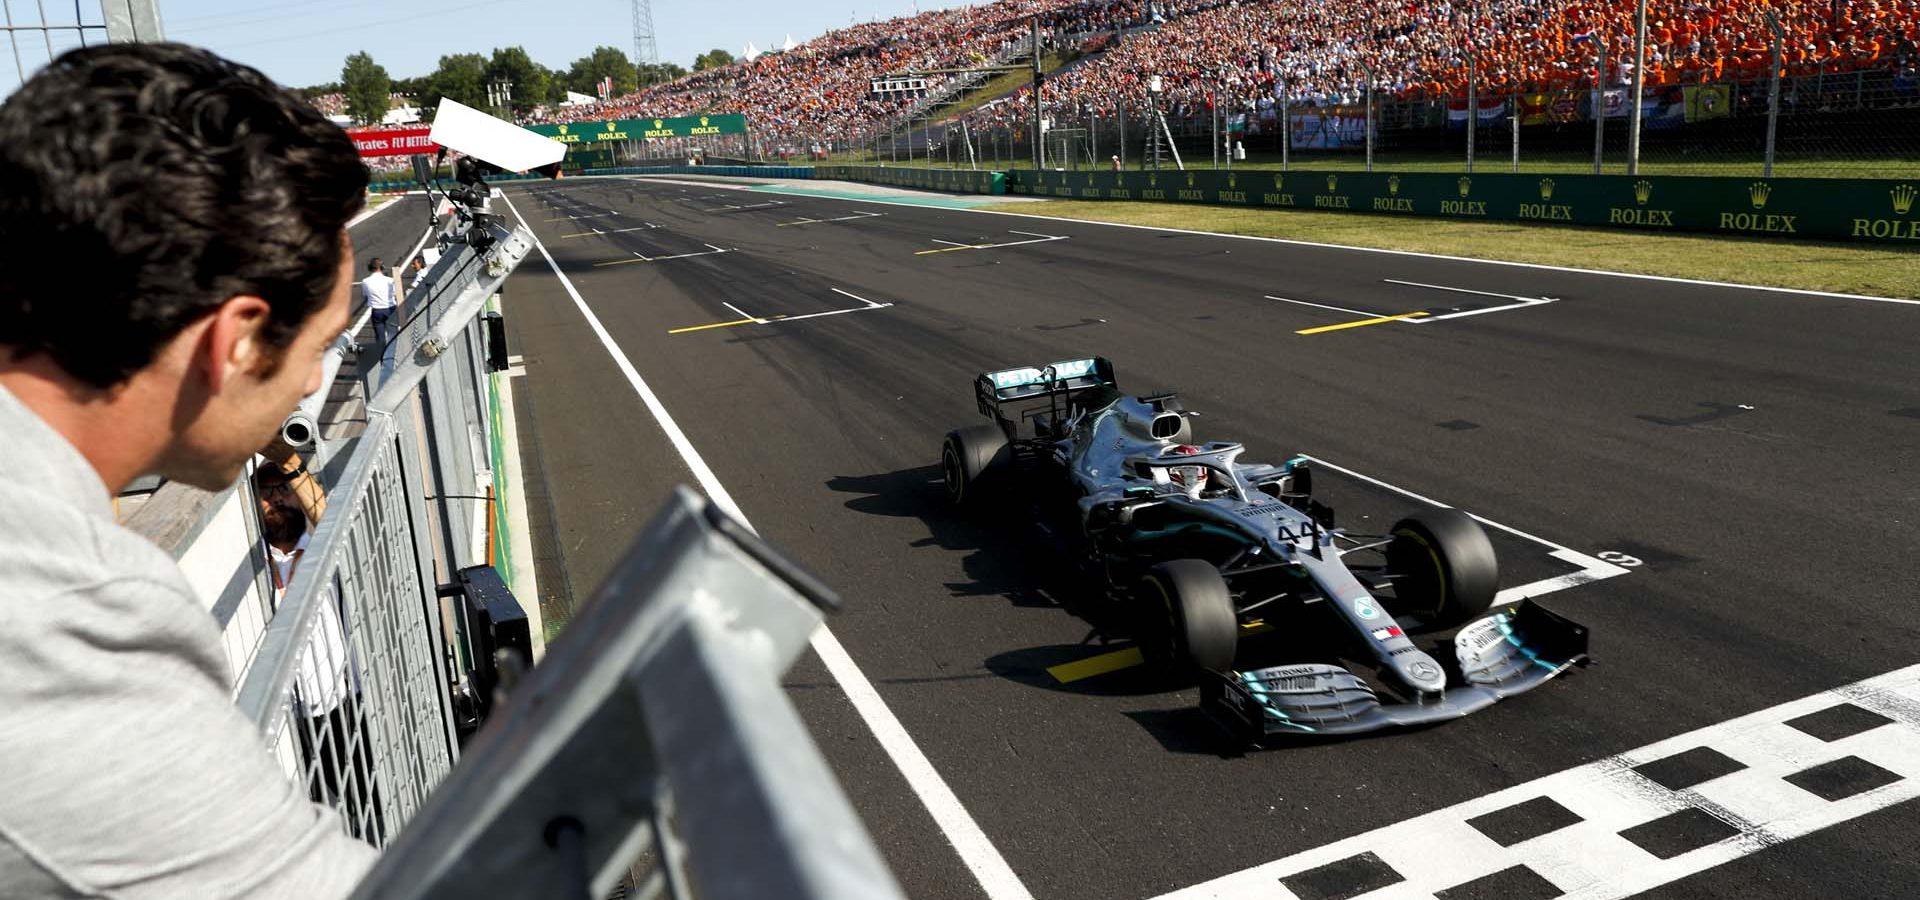 2019 Hungarian Grand Prix, Sunday - Wolfgang Wilhelm Simon Pagenaud Lewis Hamilton Mercedes